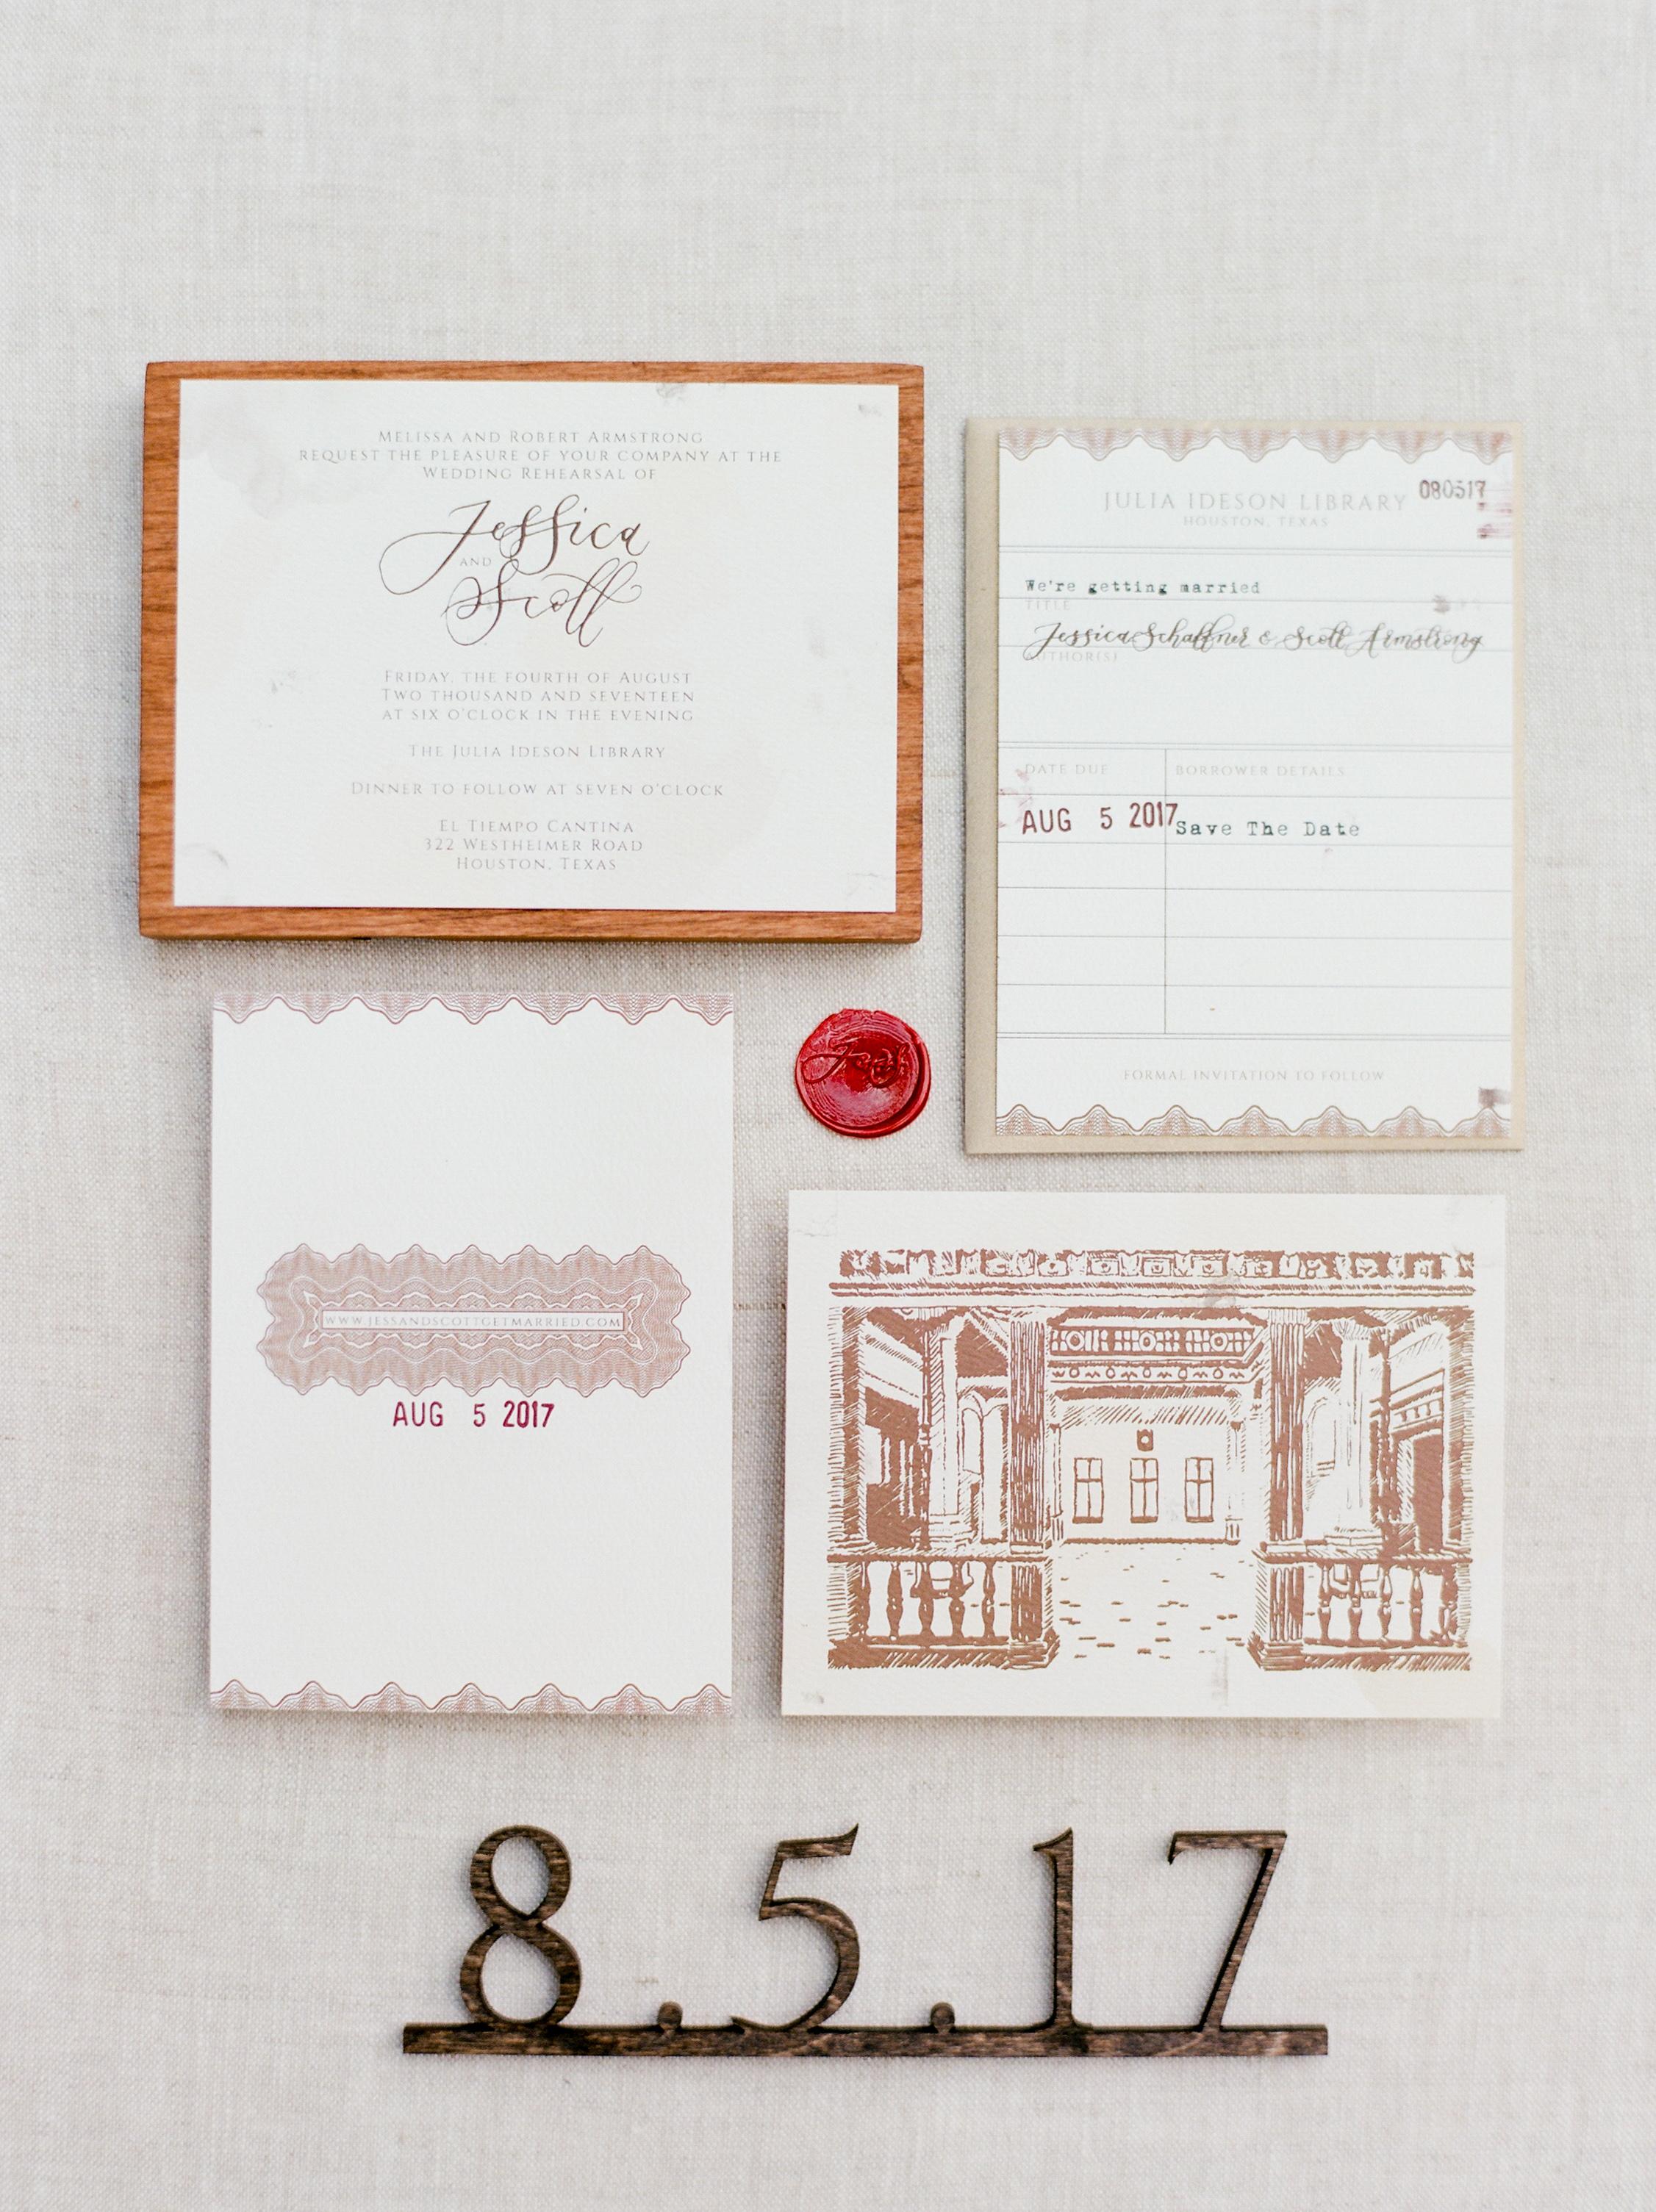 The-Knot-Texas-Fine-Art-Wedding-Film-Destination-Photographer-Houston-Austin-Dallas-New-Orleans-Julia-Ideson-Library-Event-Dana-Josh-Fernandez-Photograph-Top-Best-58.jpg